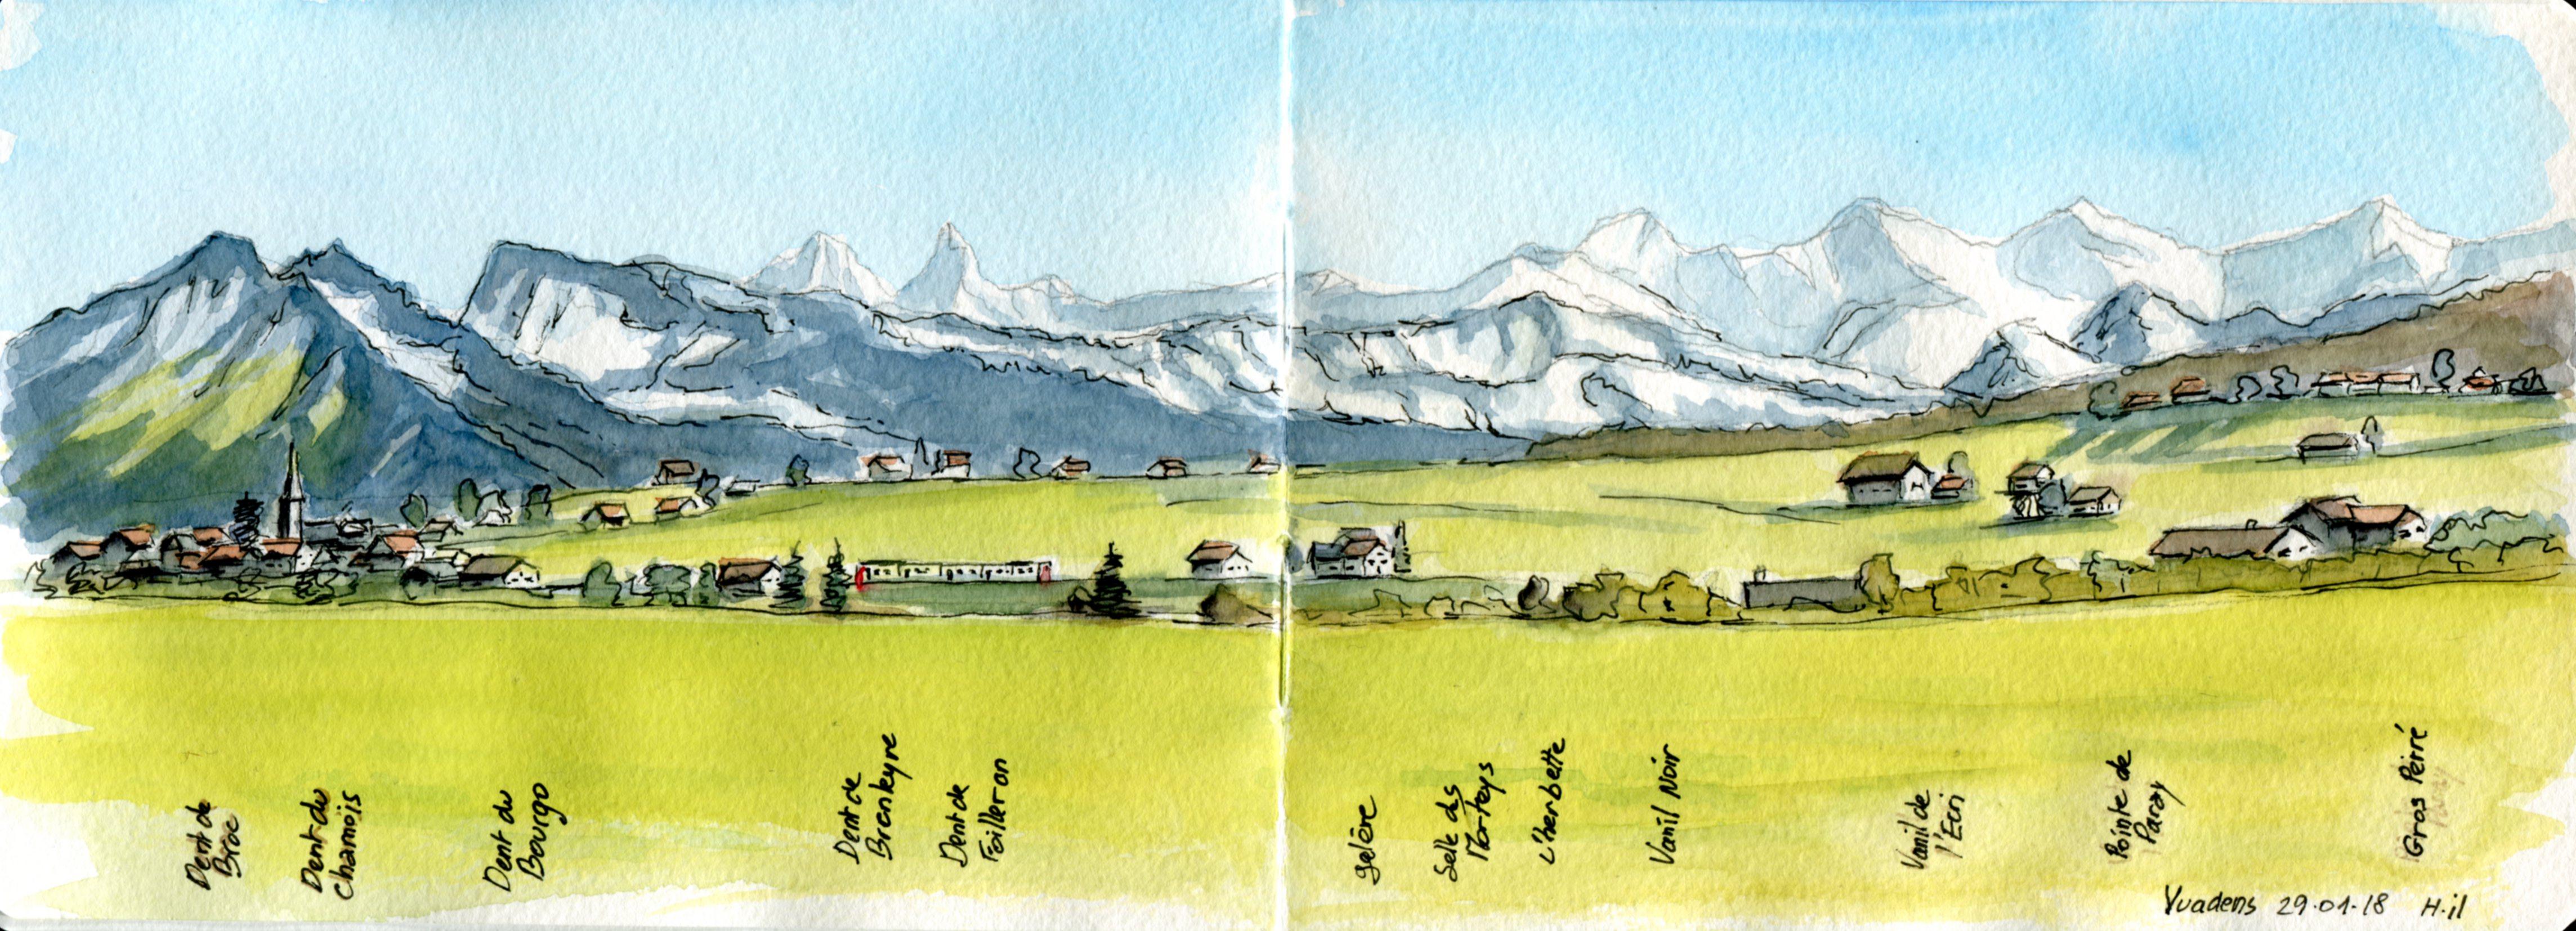 Panorama Vuadens145